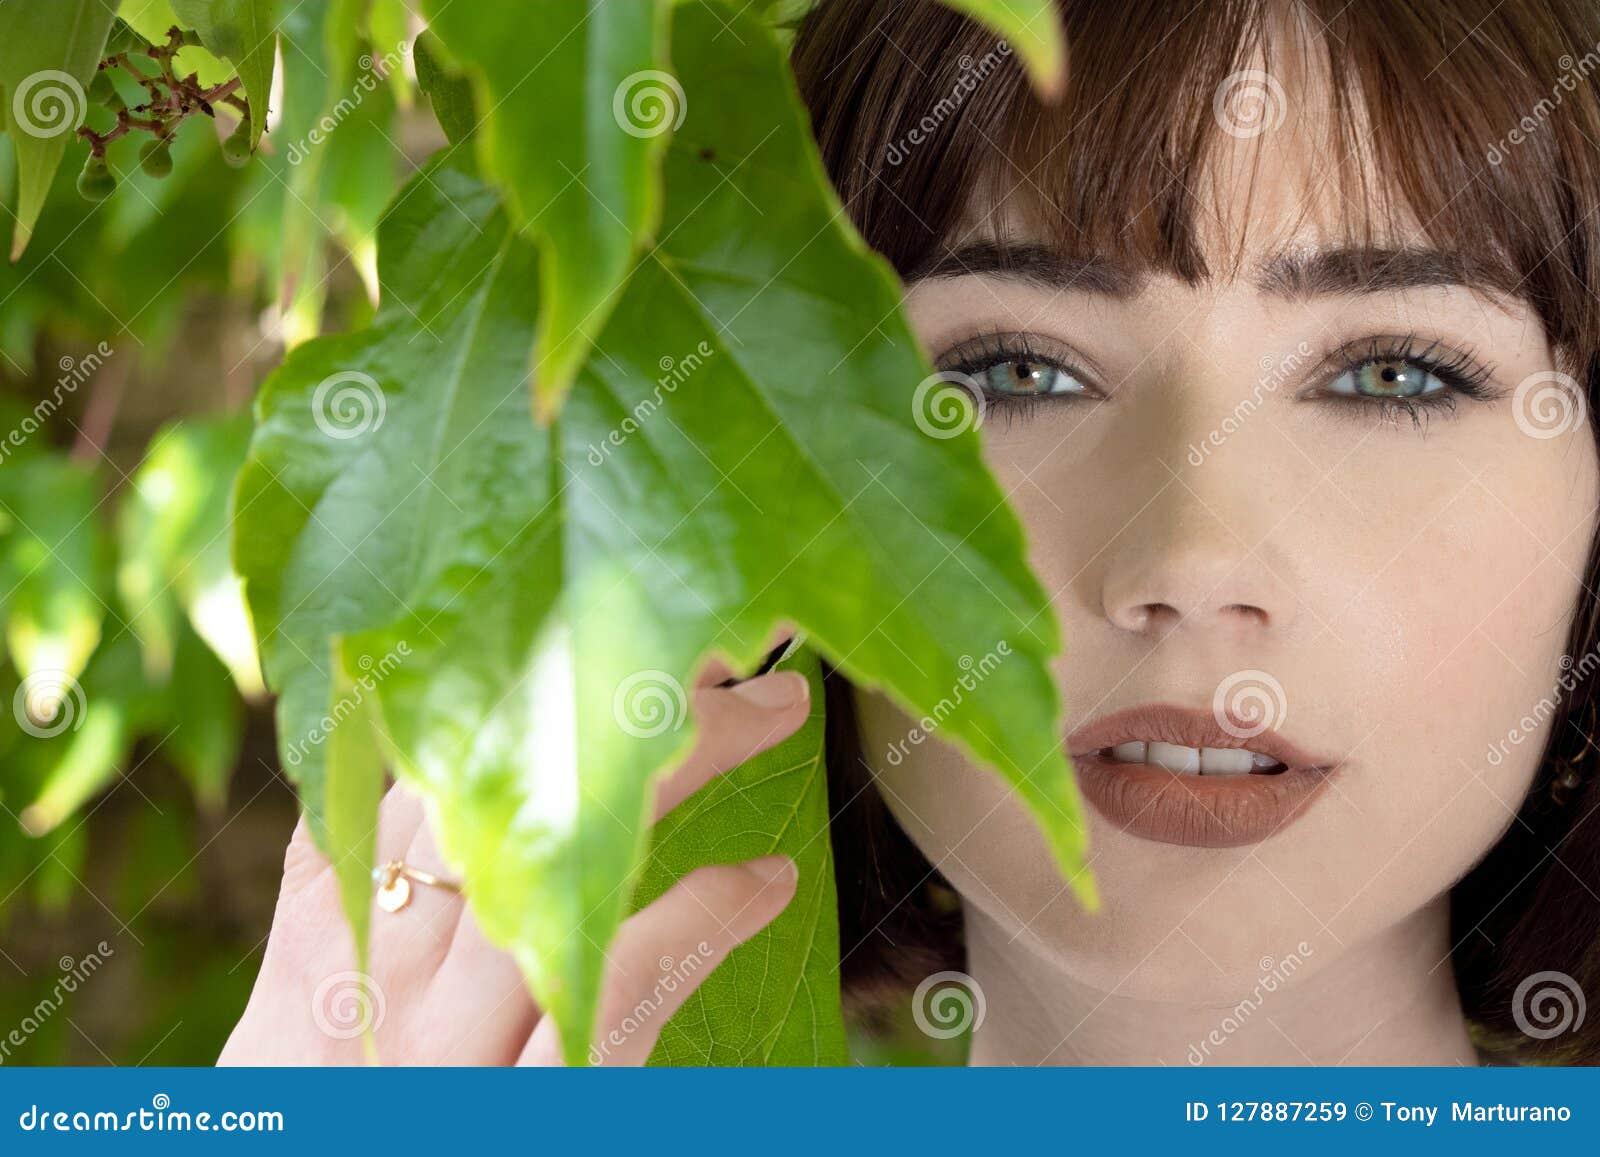 Bella donna dietro le foglie verdi che esaminano macchina fotografica